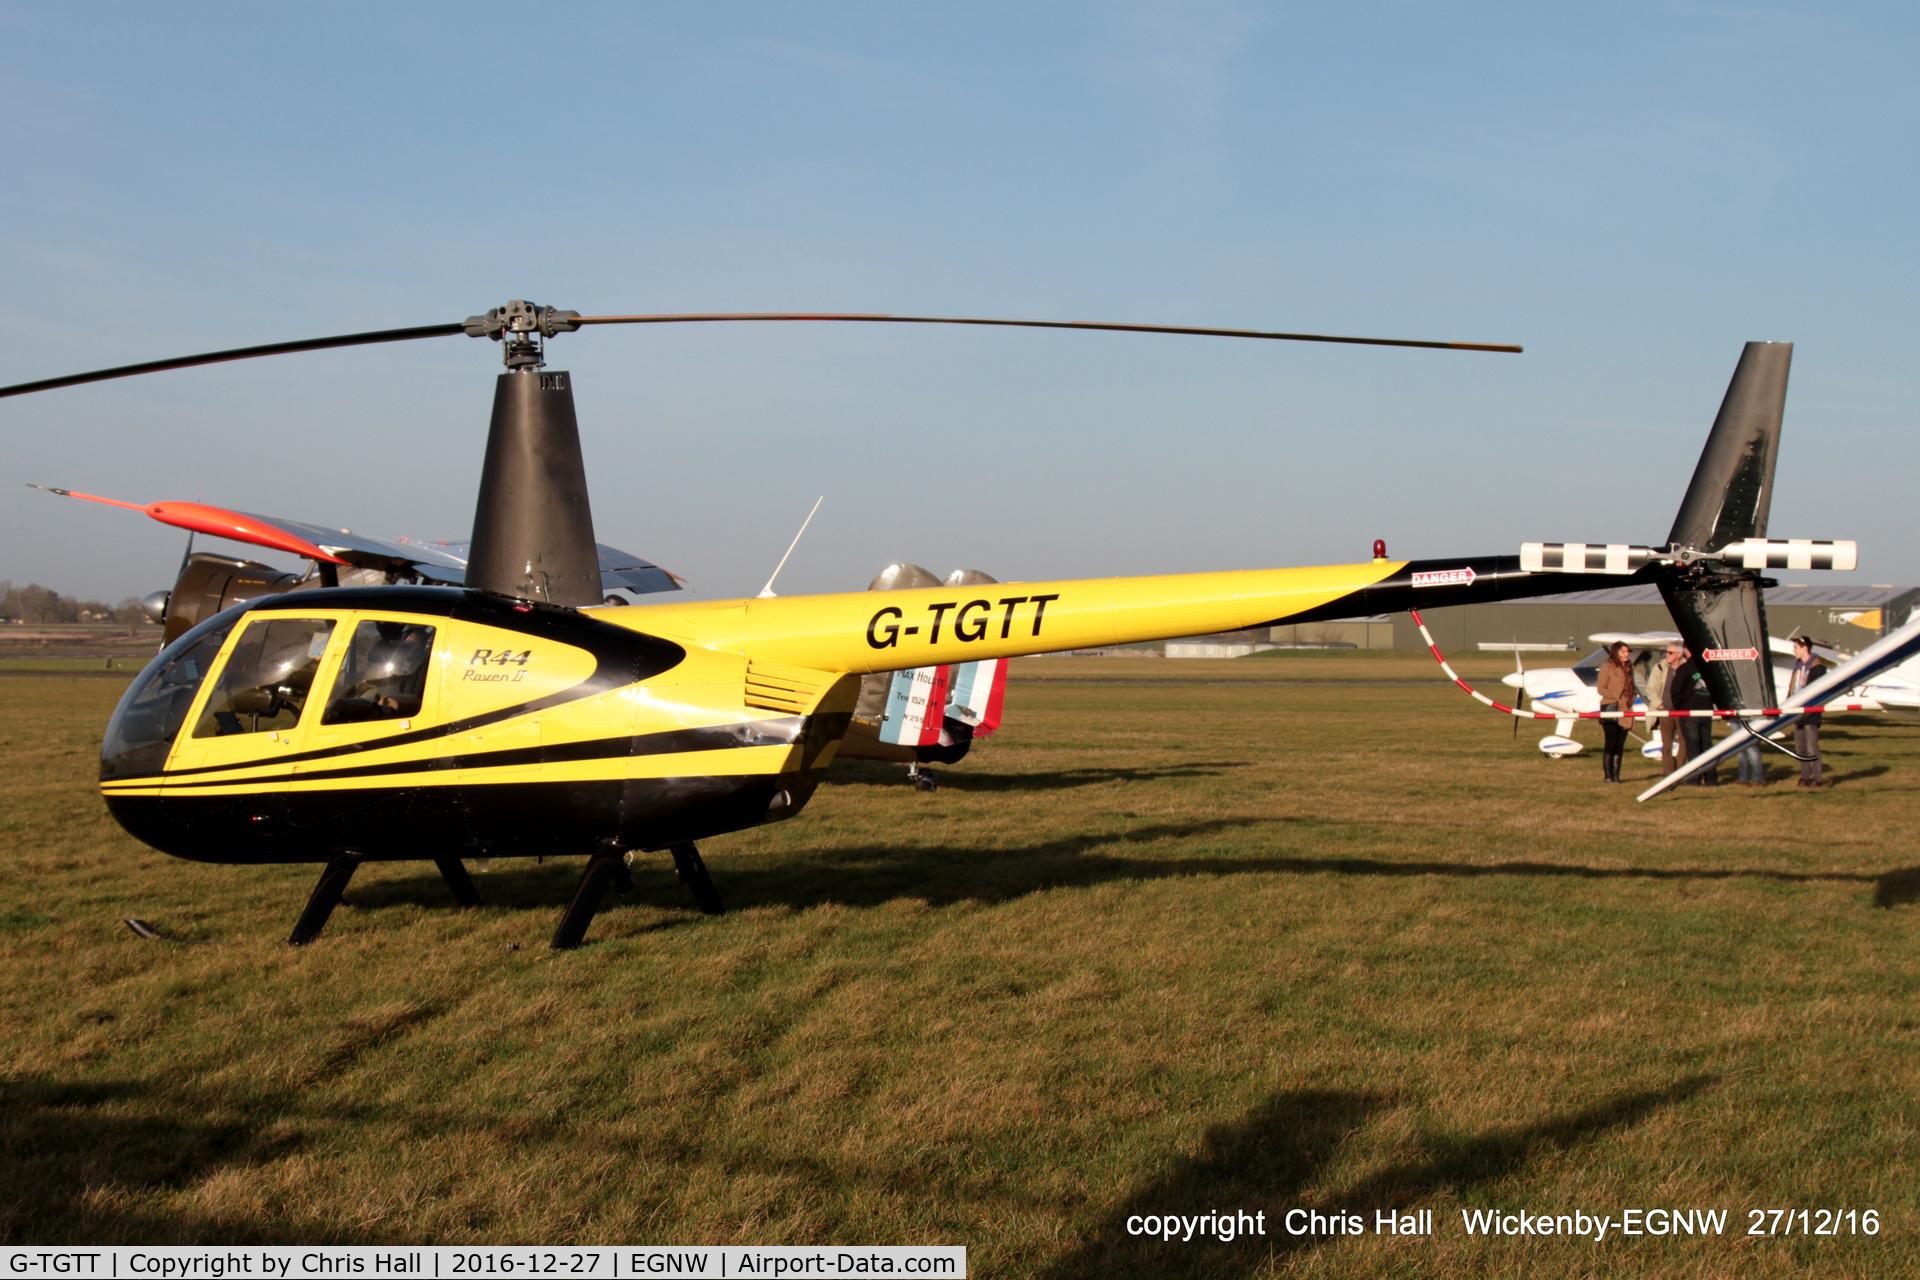 G-TGTT, 2002 Robinson R44 Raven II C/N 10023, at the Wickenby